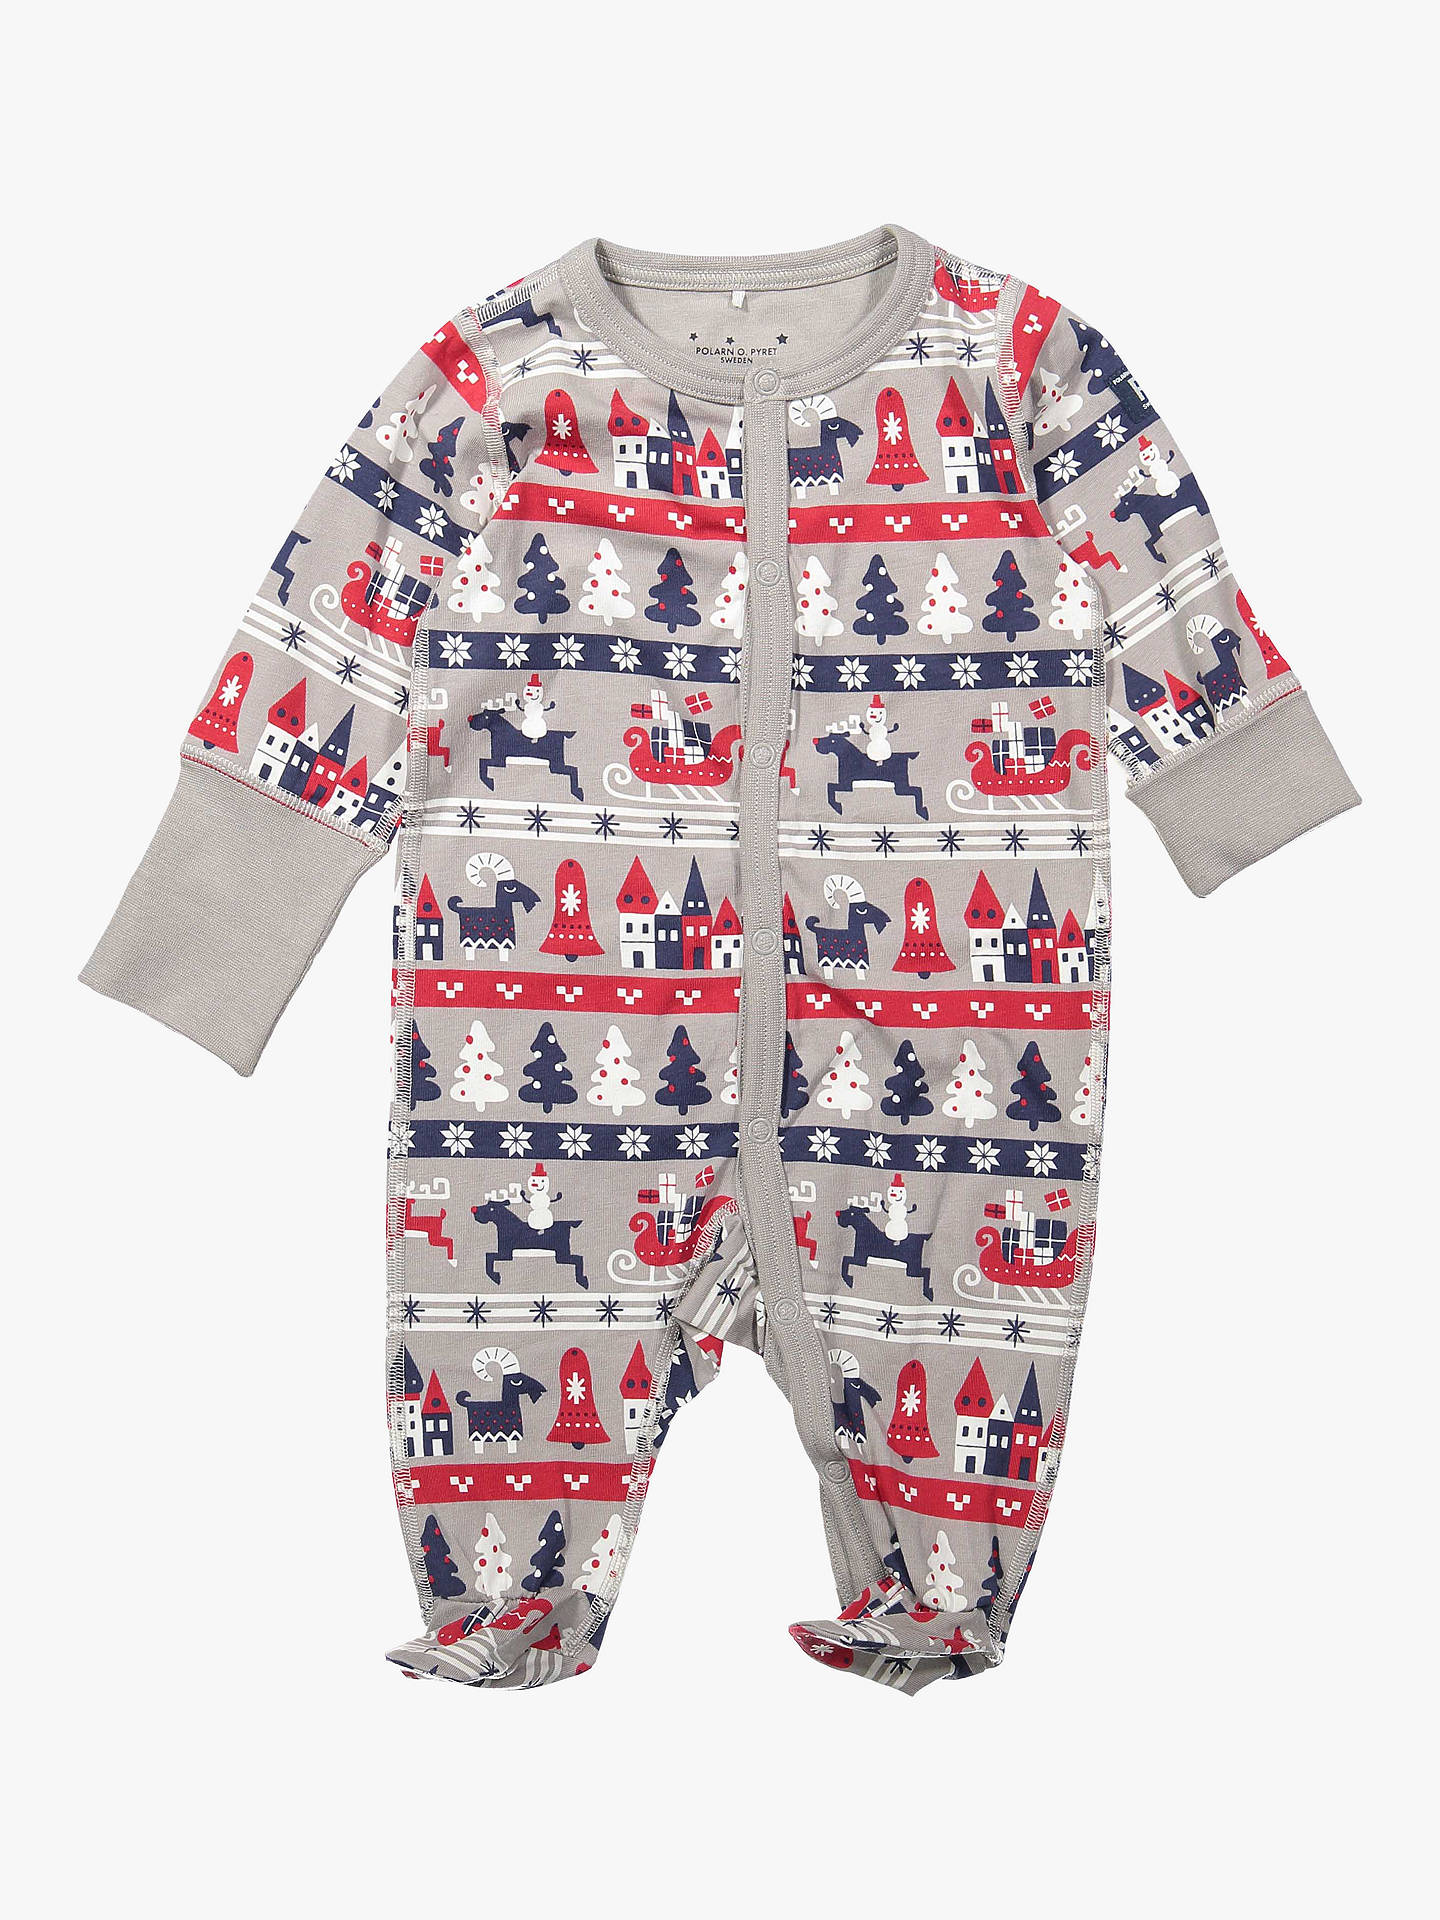 4993d118a Polarn O. Pyret Baby GOTS Organic Cotton Xmas Onesie